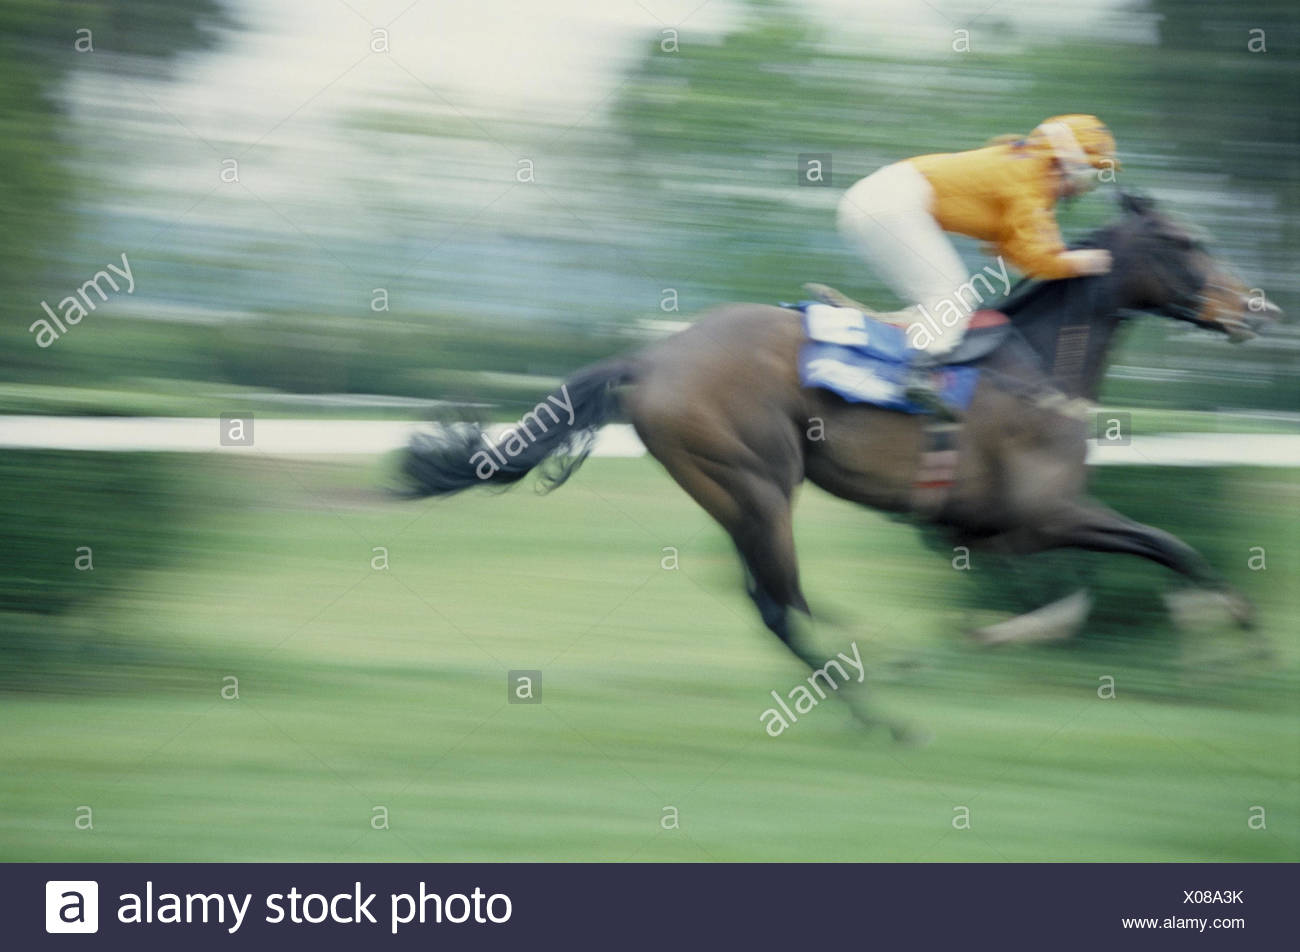 Gallop Races Bleeds Blur Side View Racecourse Horses Race Horse Riding Galopper Jockey Ride Derby